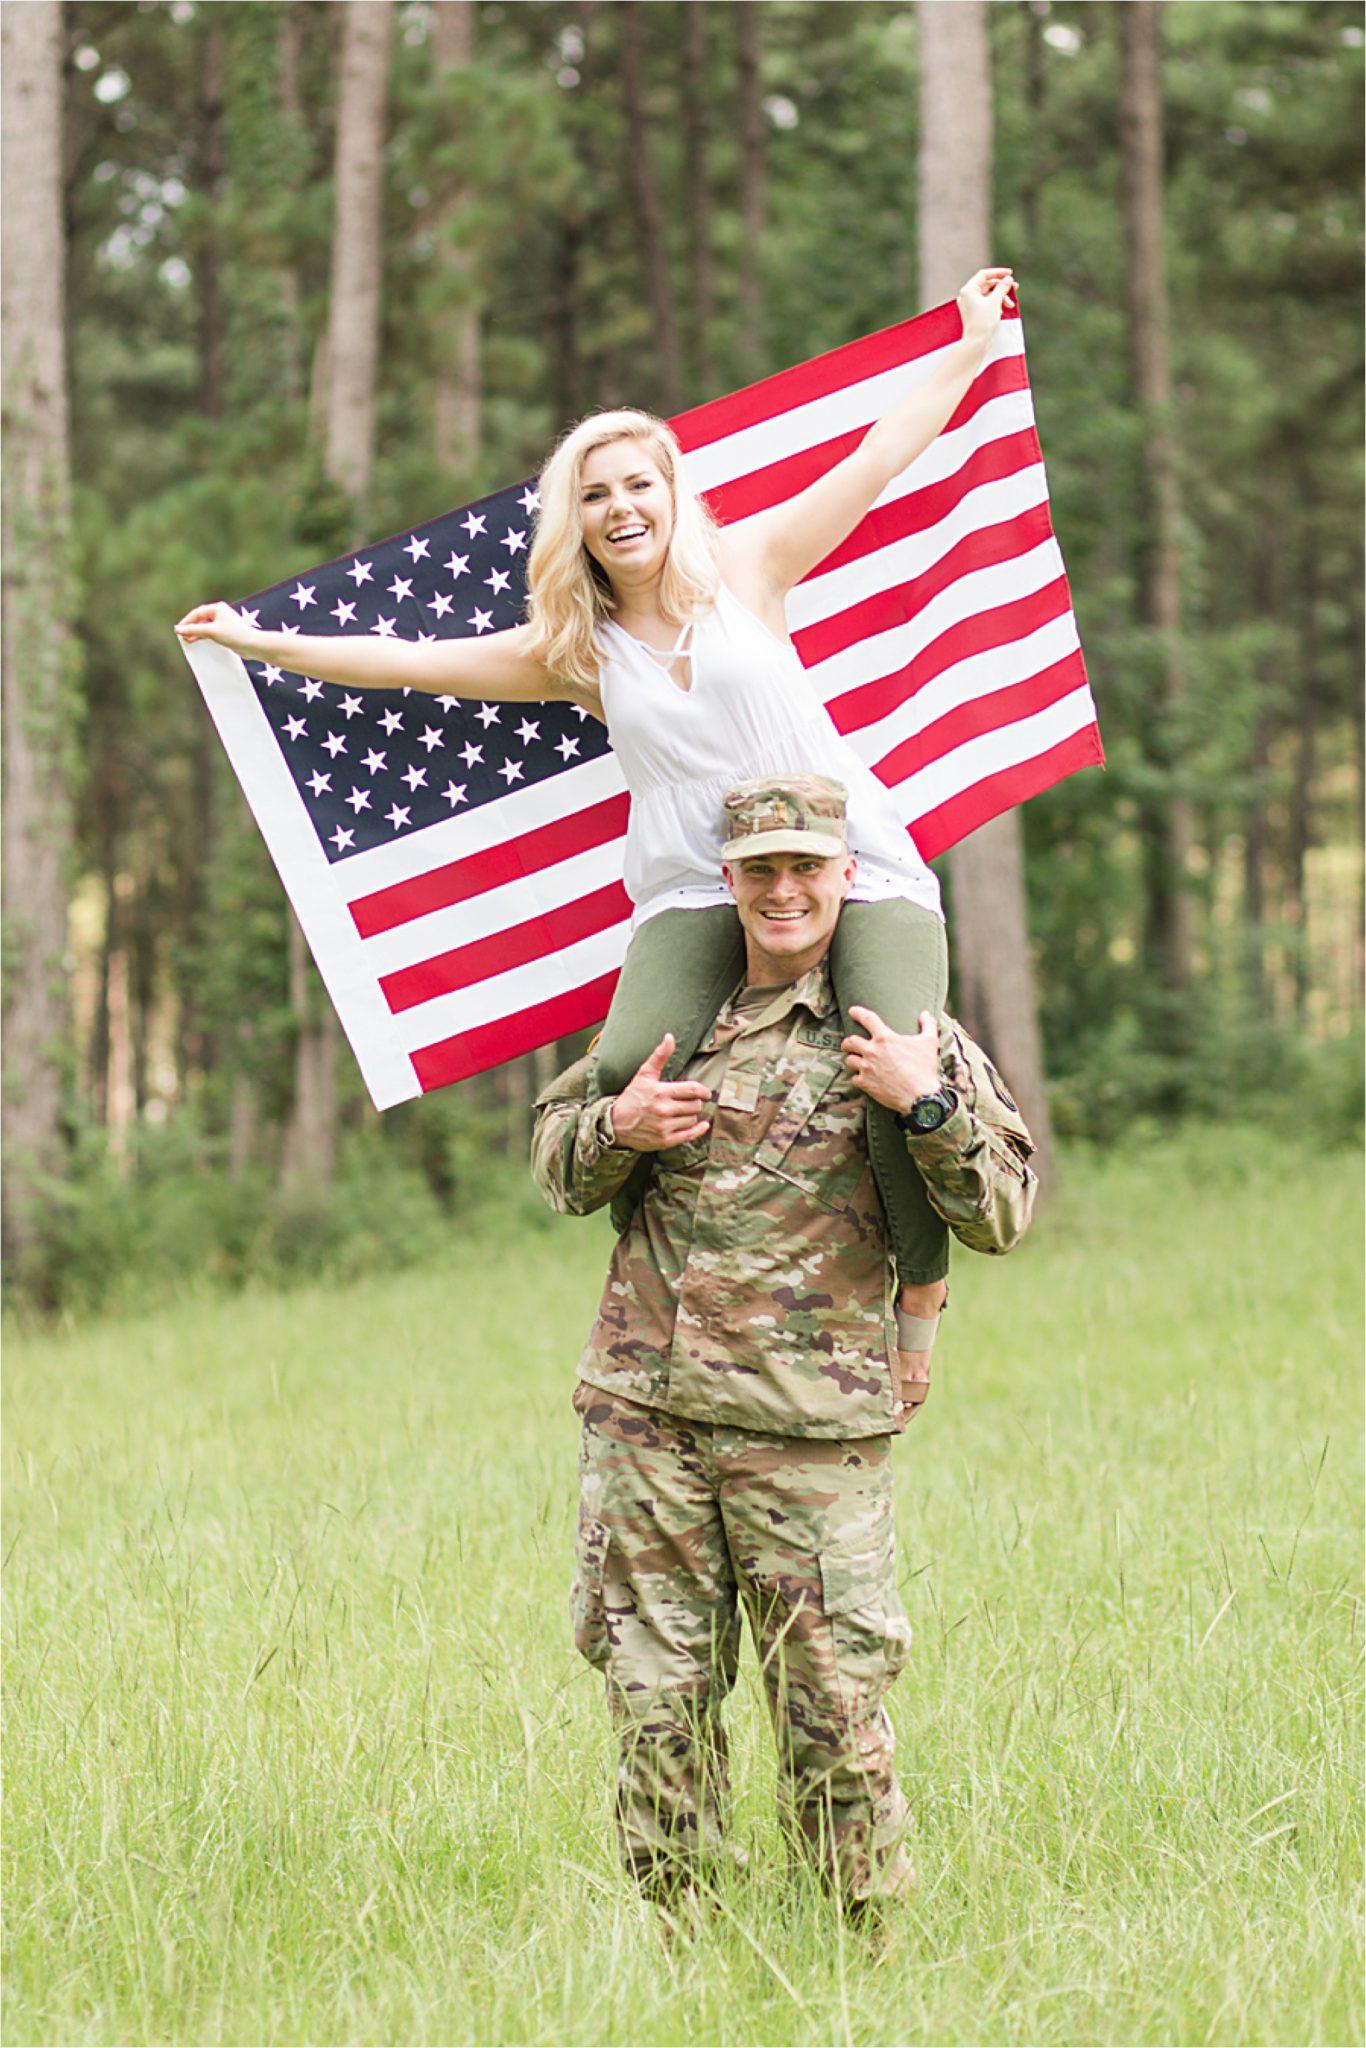 Laurel Mississippi, Brett & Sarah, Romantic Military Engagement, Mobile Alabama Photographer, Engagement Shoot Inspiration, American Flag Engagement Shoot